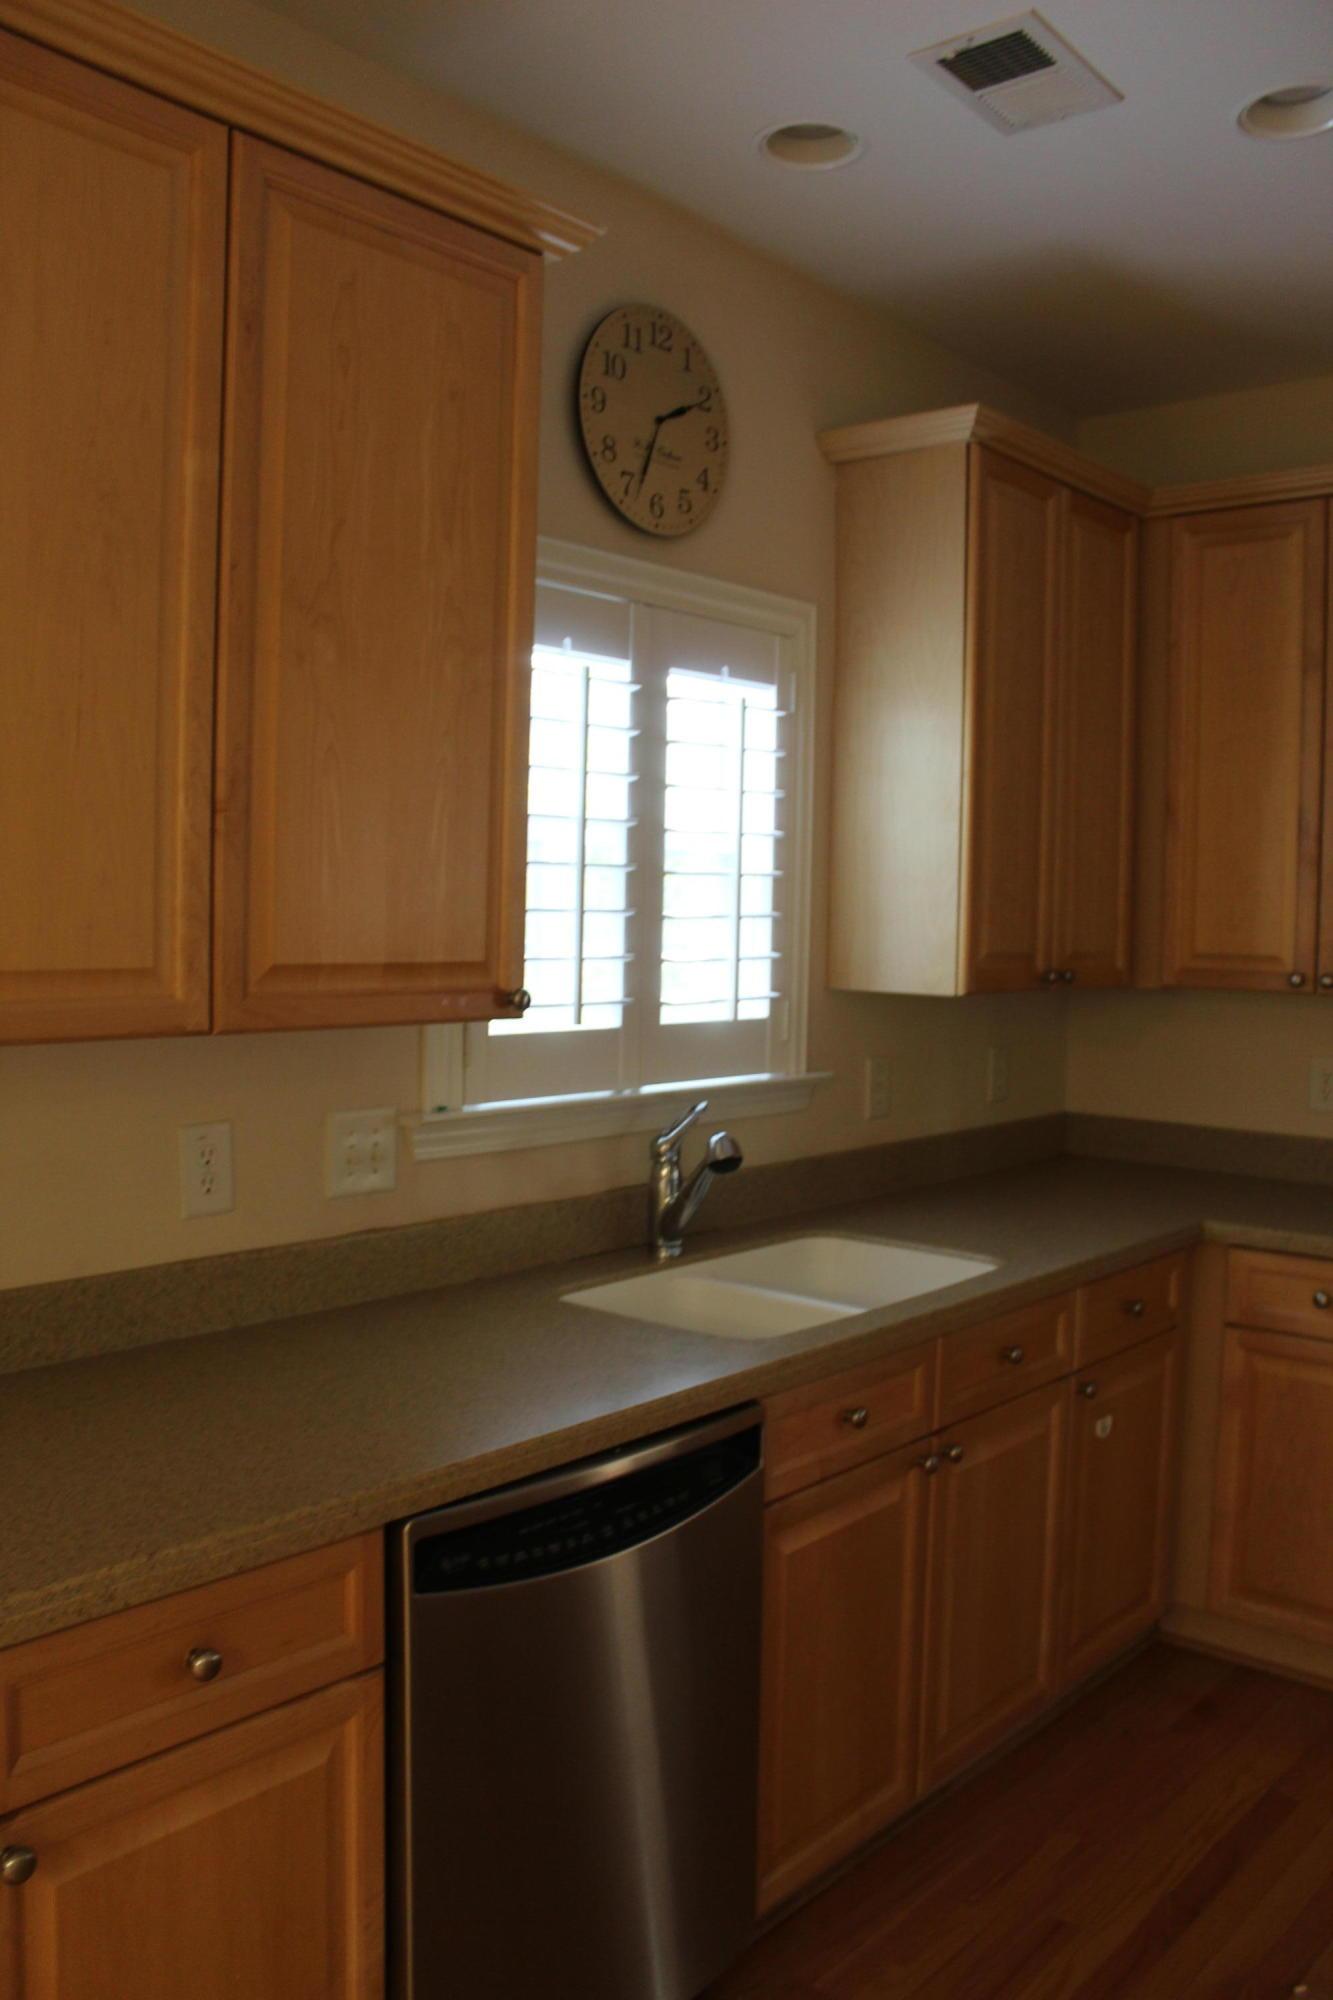 Hunt Club Phase II Homes For Sale - 1220 Walleye, Charleston, SC - 6